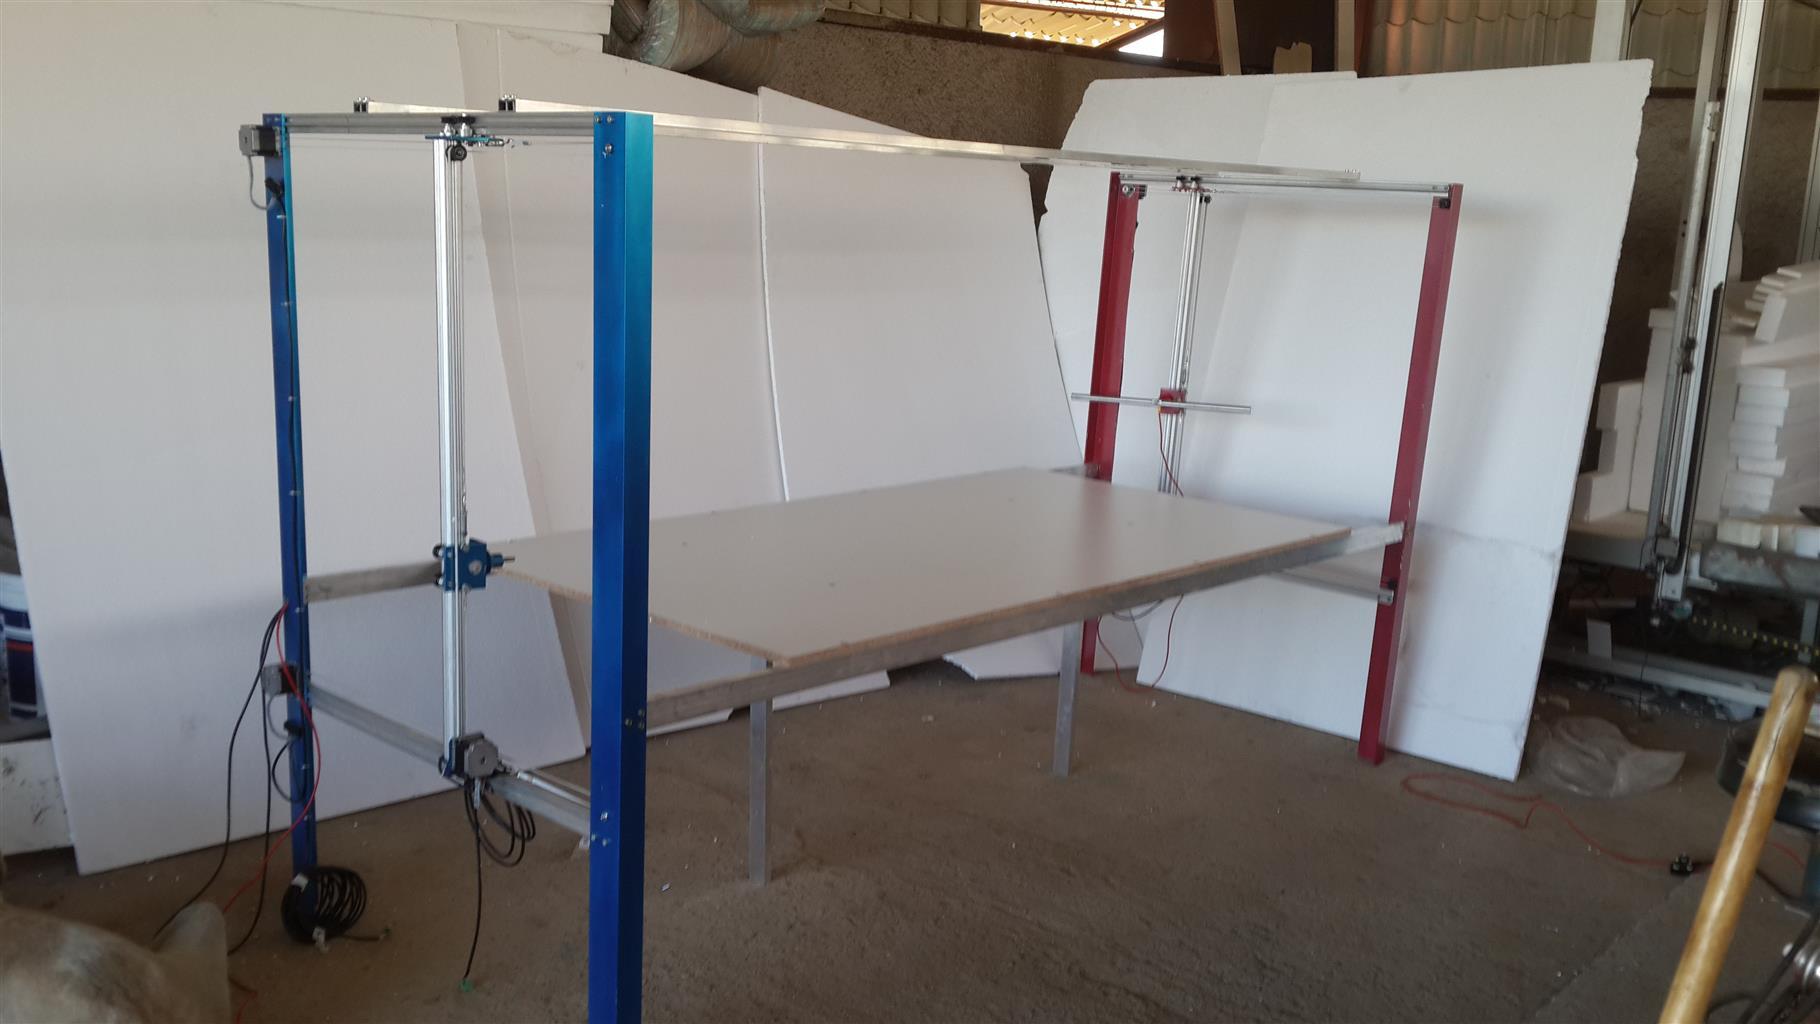 Cornice Cutting Polystyrene CNC Machine | Junk Mail